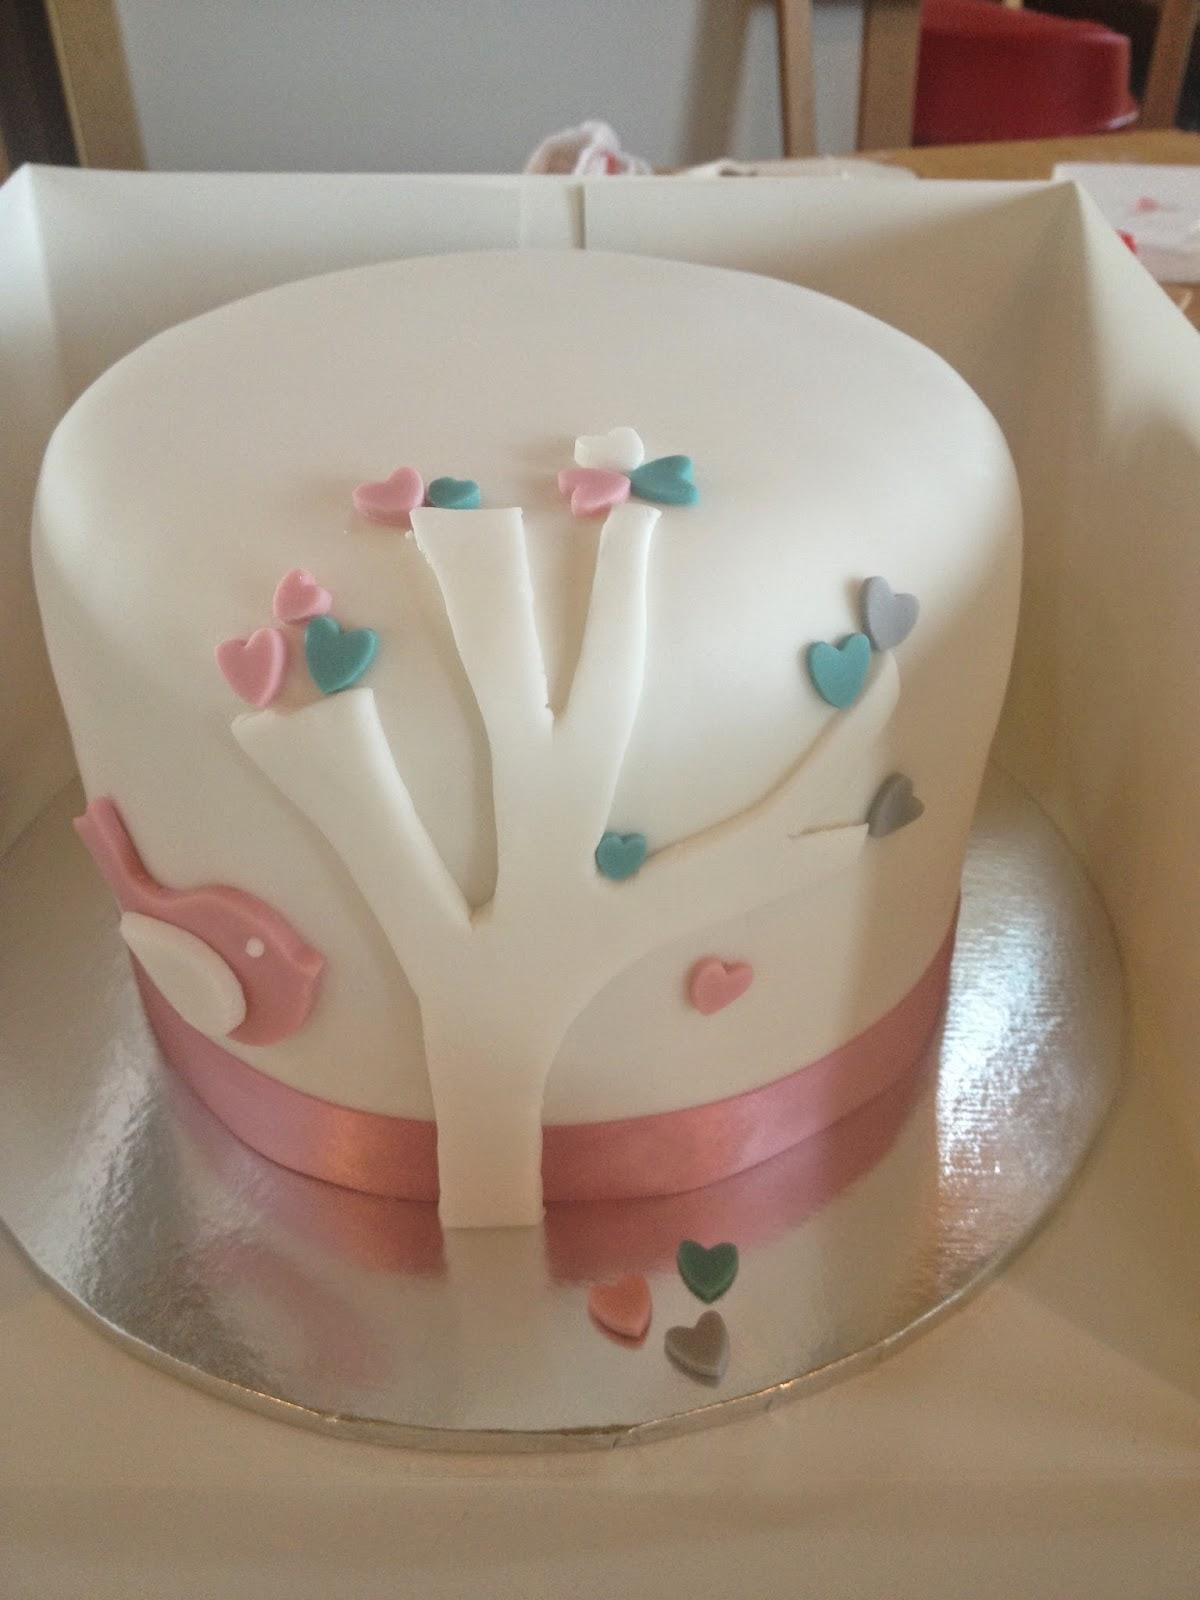 Bad Girls Make Good Cake June 2014